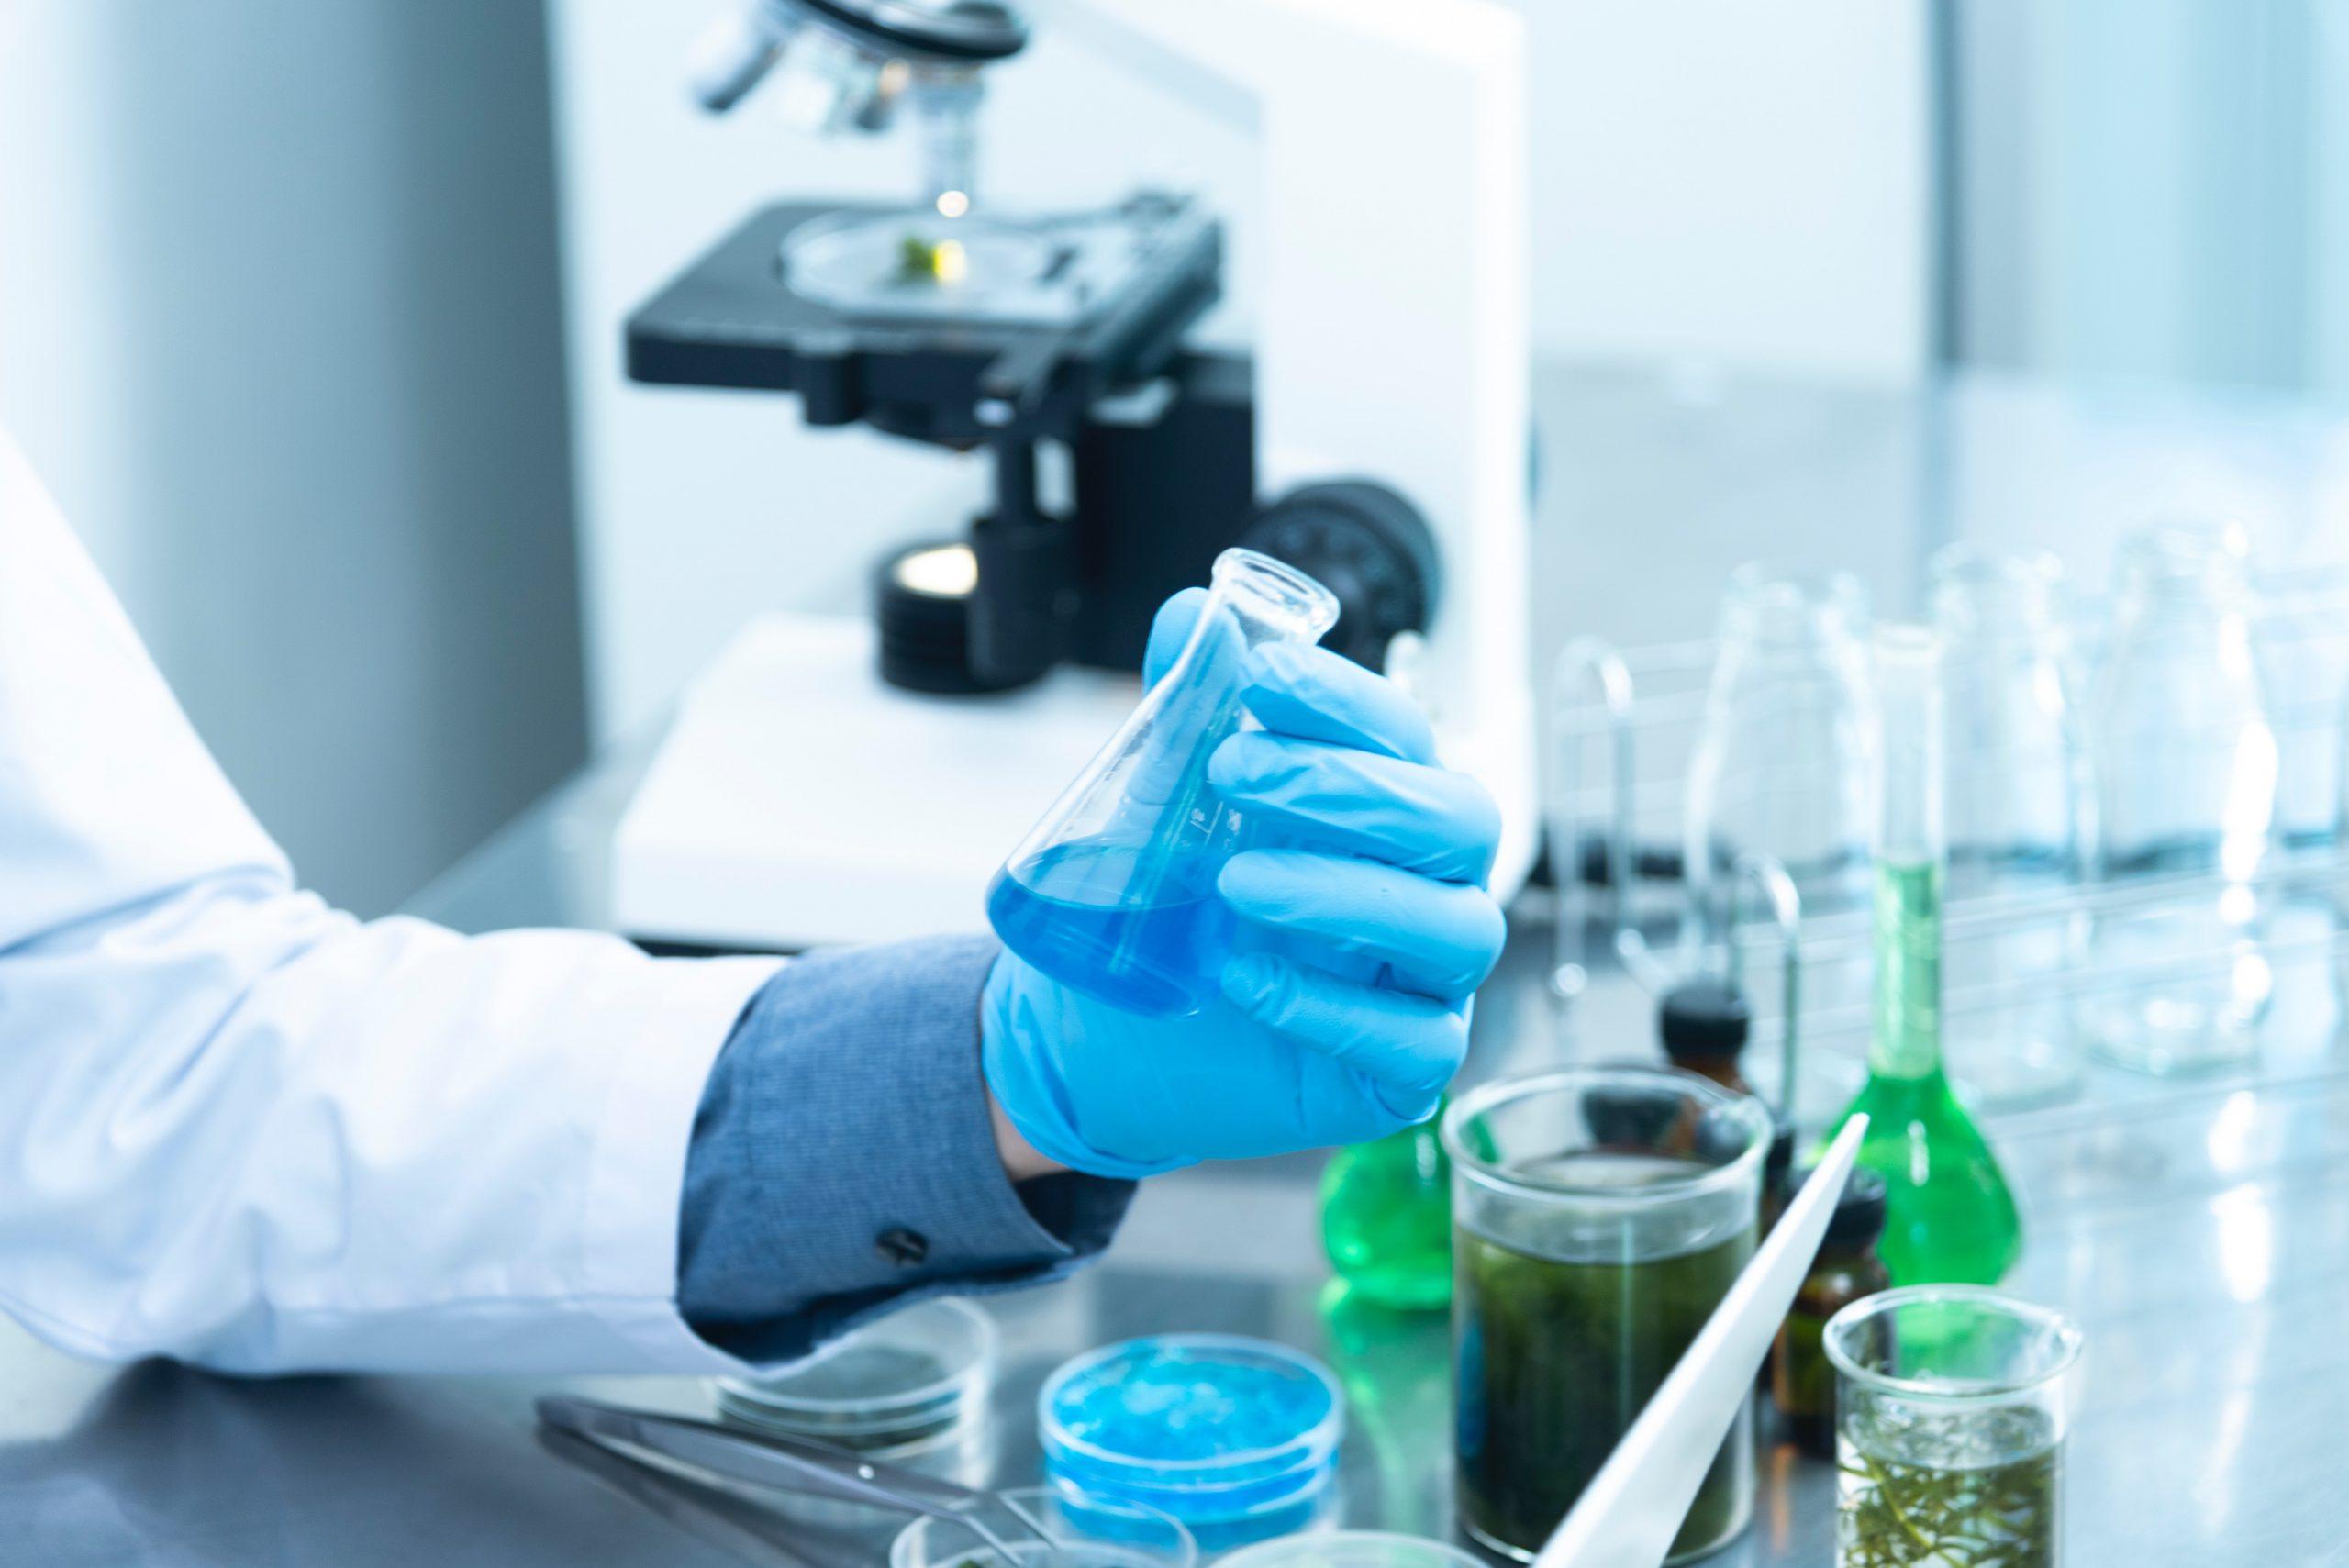 The Pediatric Cancer Clinical Trial Debacle